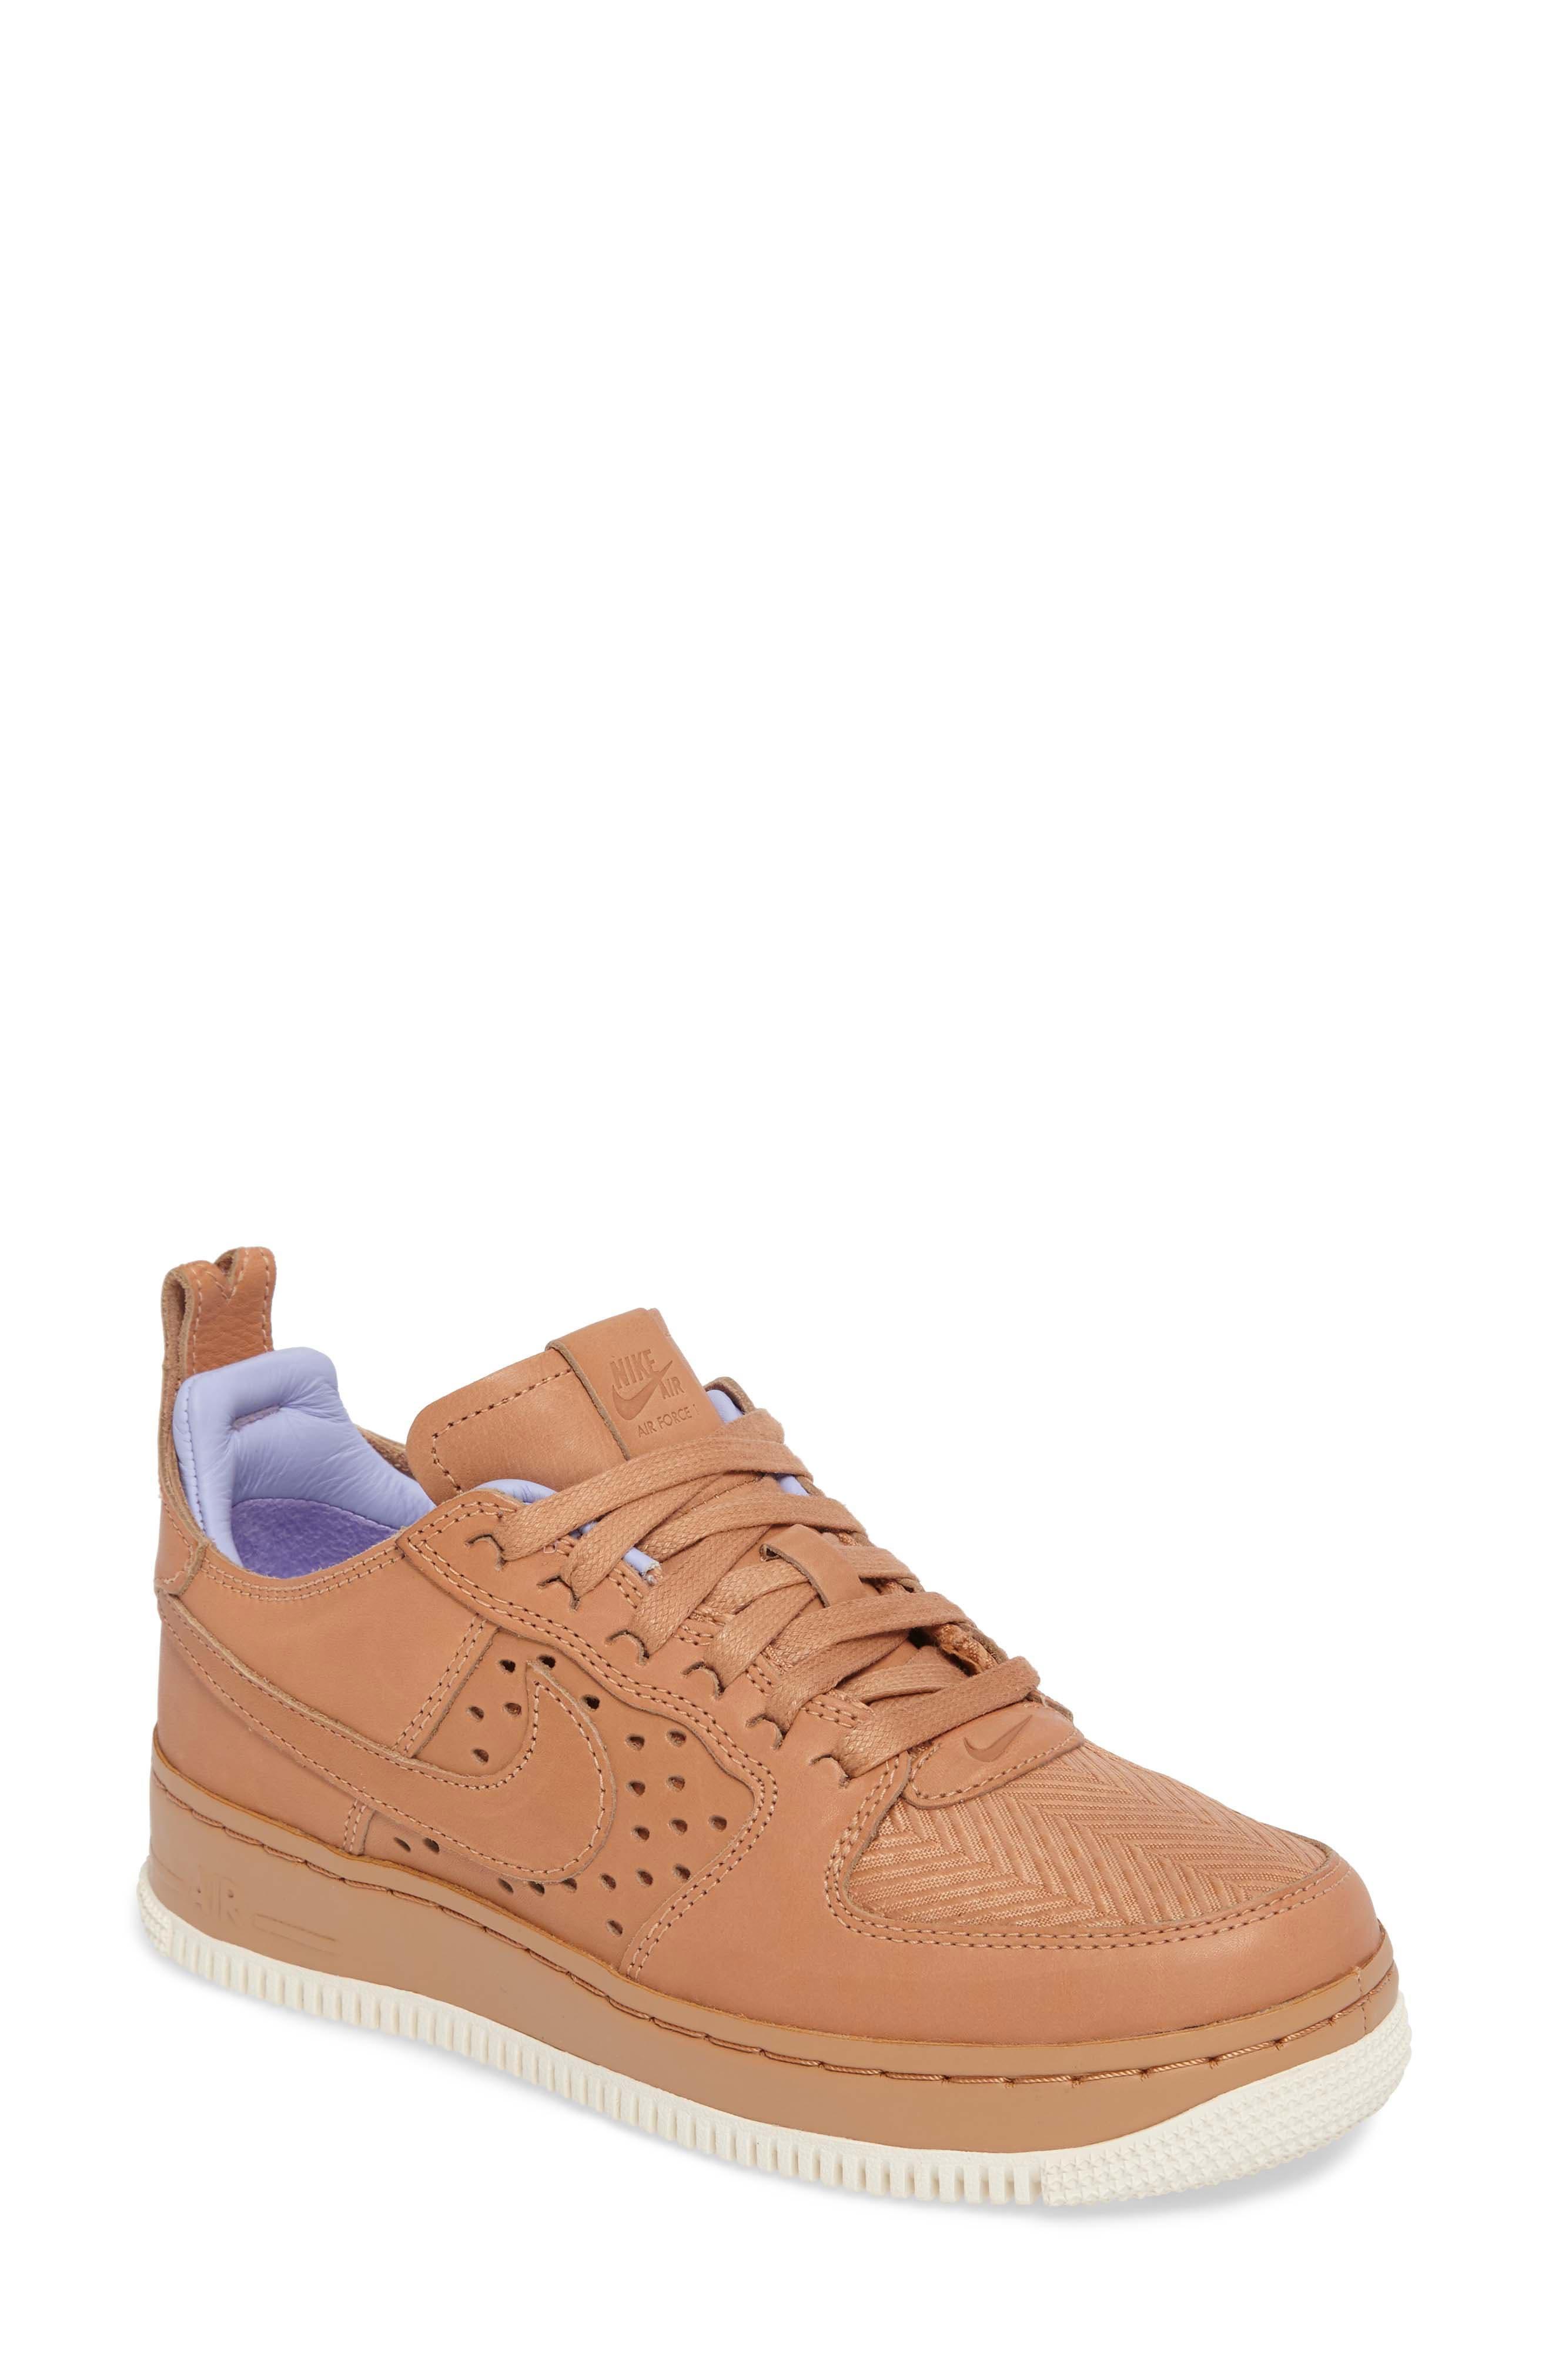 Nike NikeLab Air Force 1 CMFT TC Sneaker (Women)